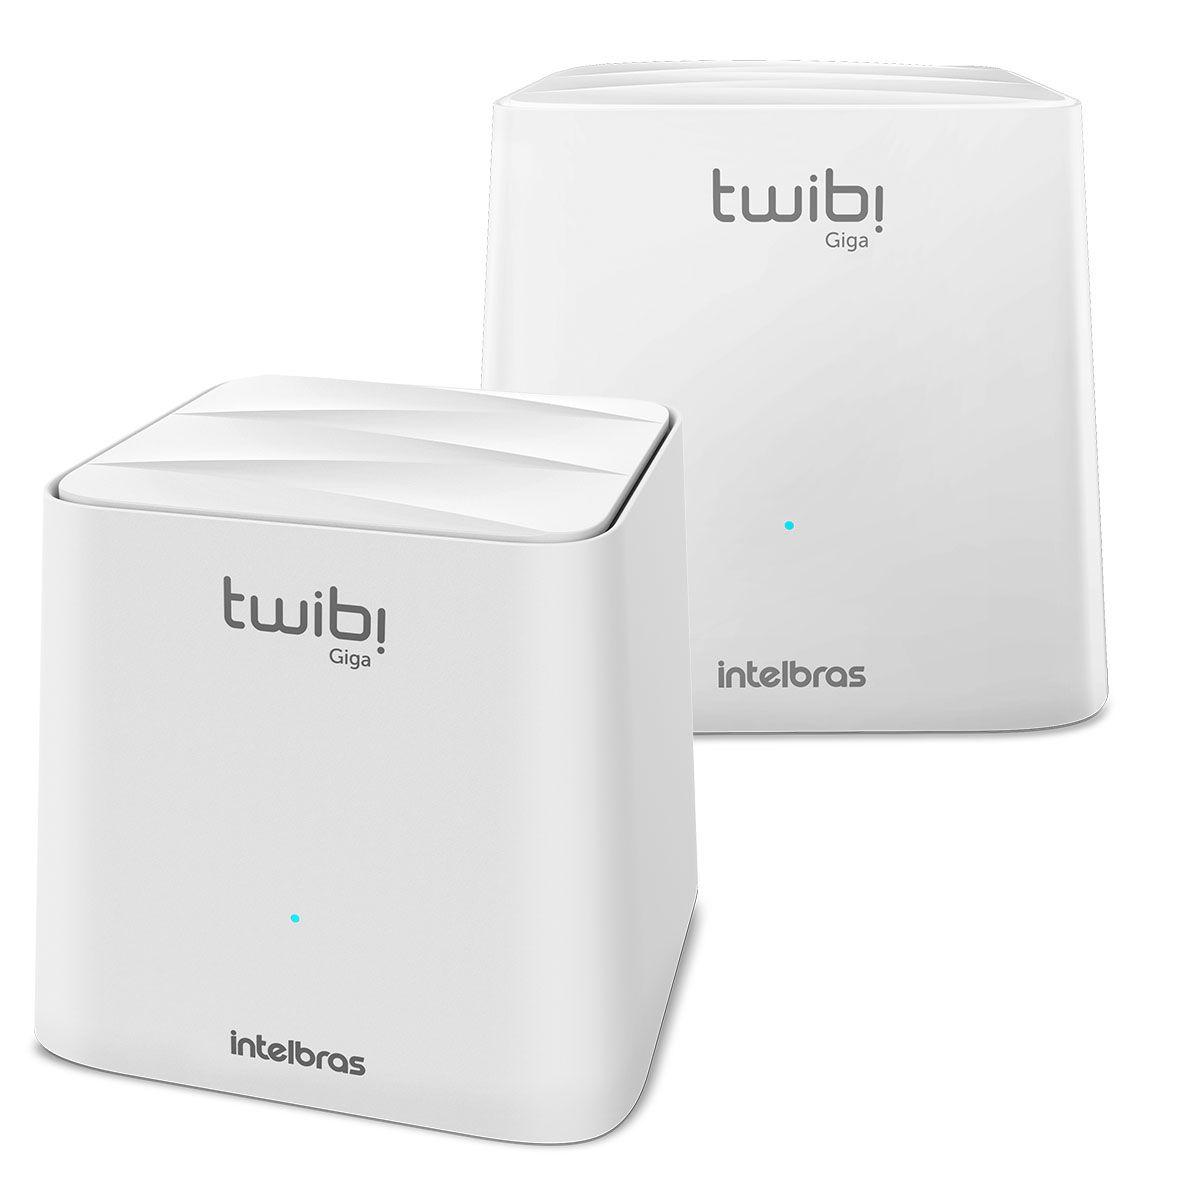 Roteador Wi-Fi Mesh Intelbras Twibi Giga 2 Módulos